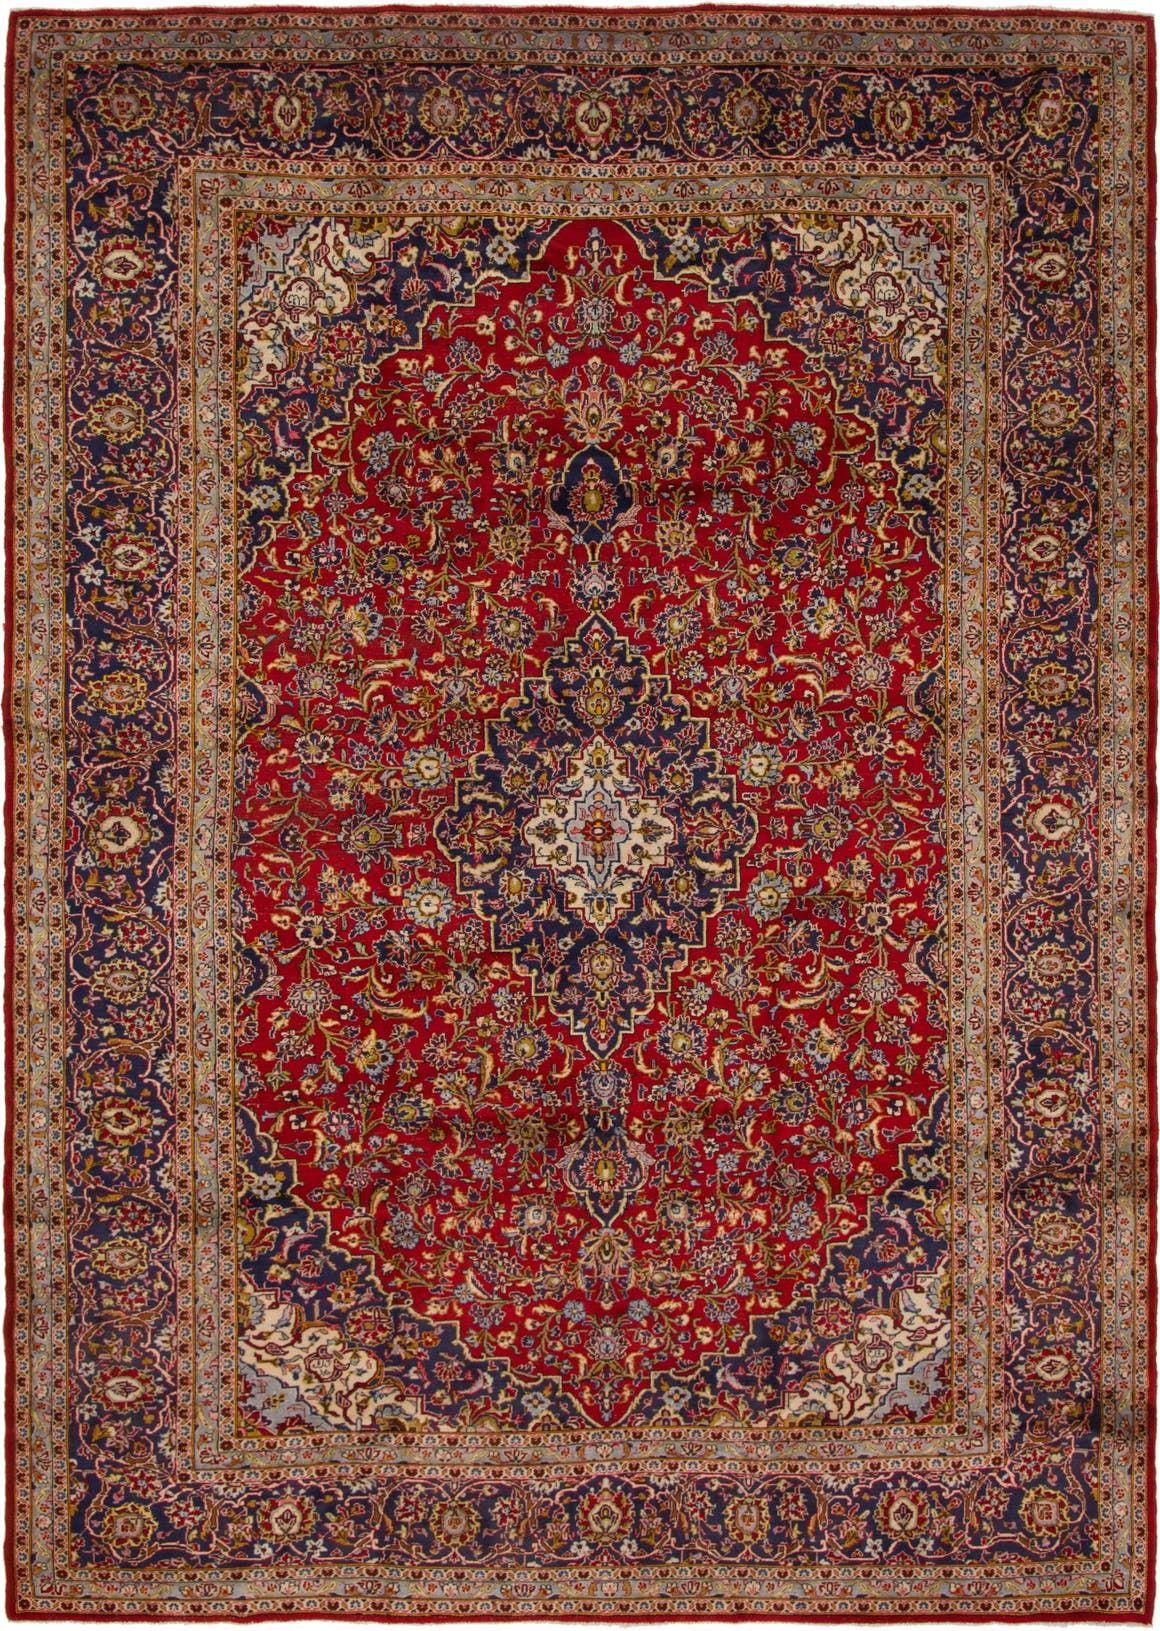 Kashan Red Antique 10x14 Area Rug In 2020 Rugs Antique Persian Carpet Kashan Rug